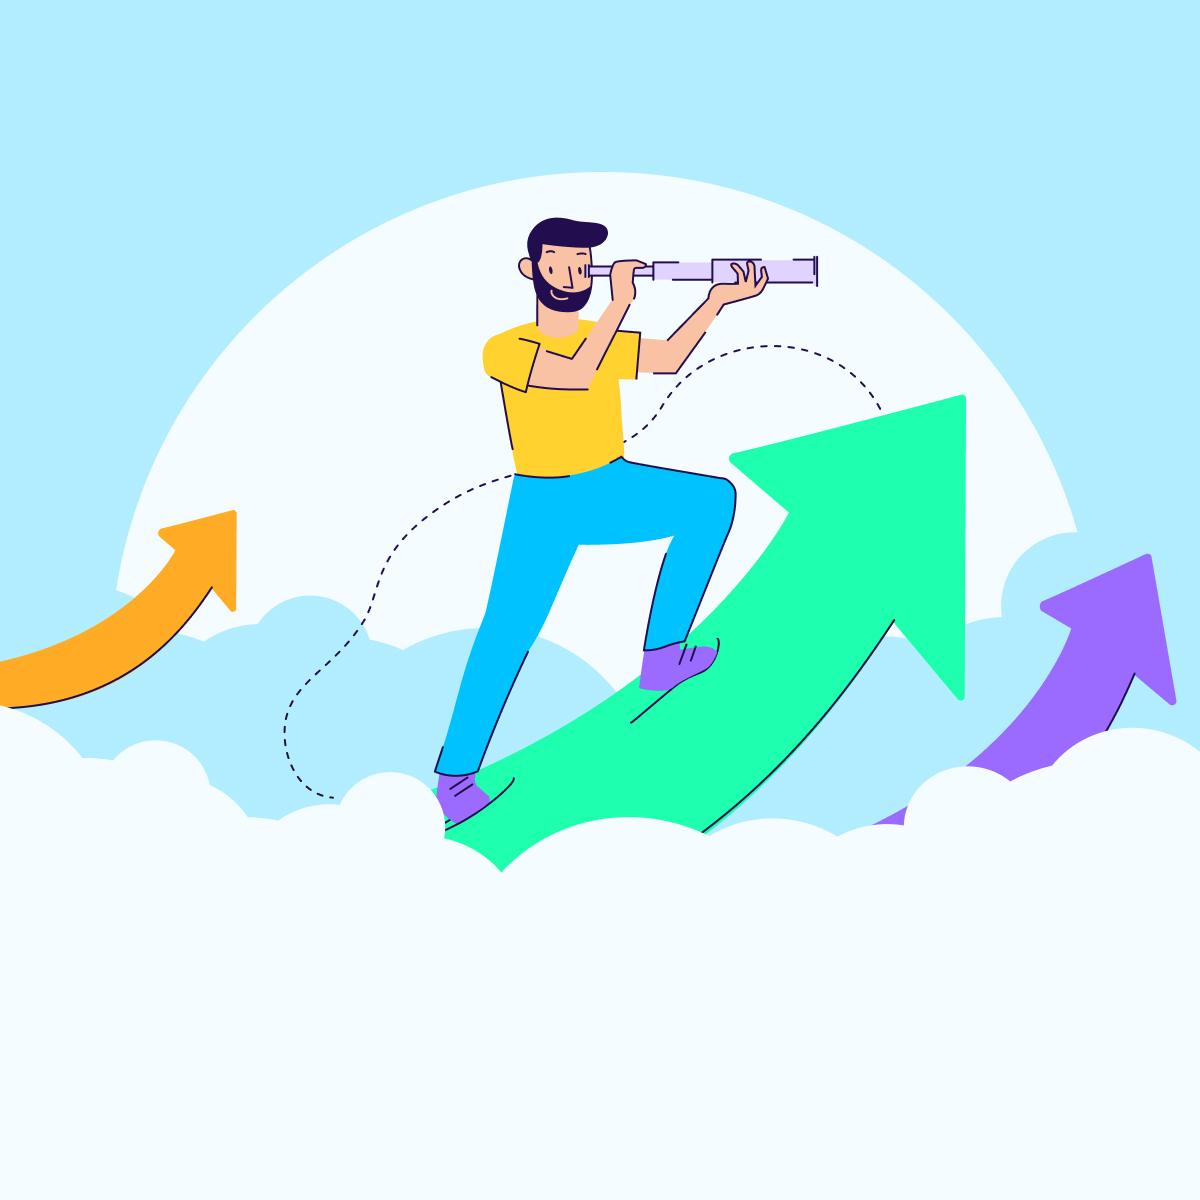 predictive marketing explained - Square